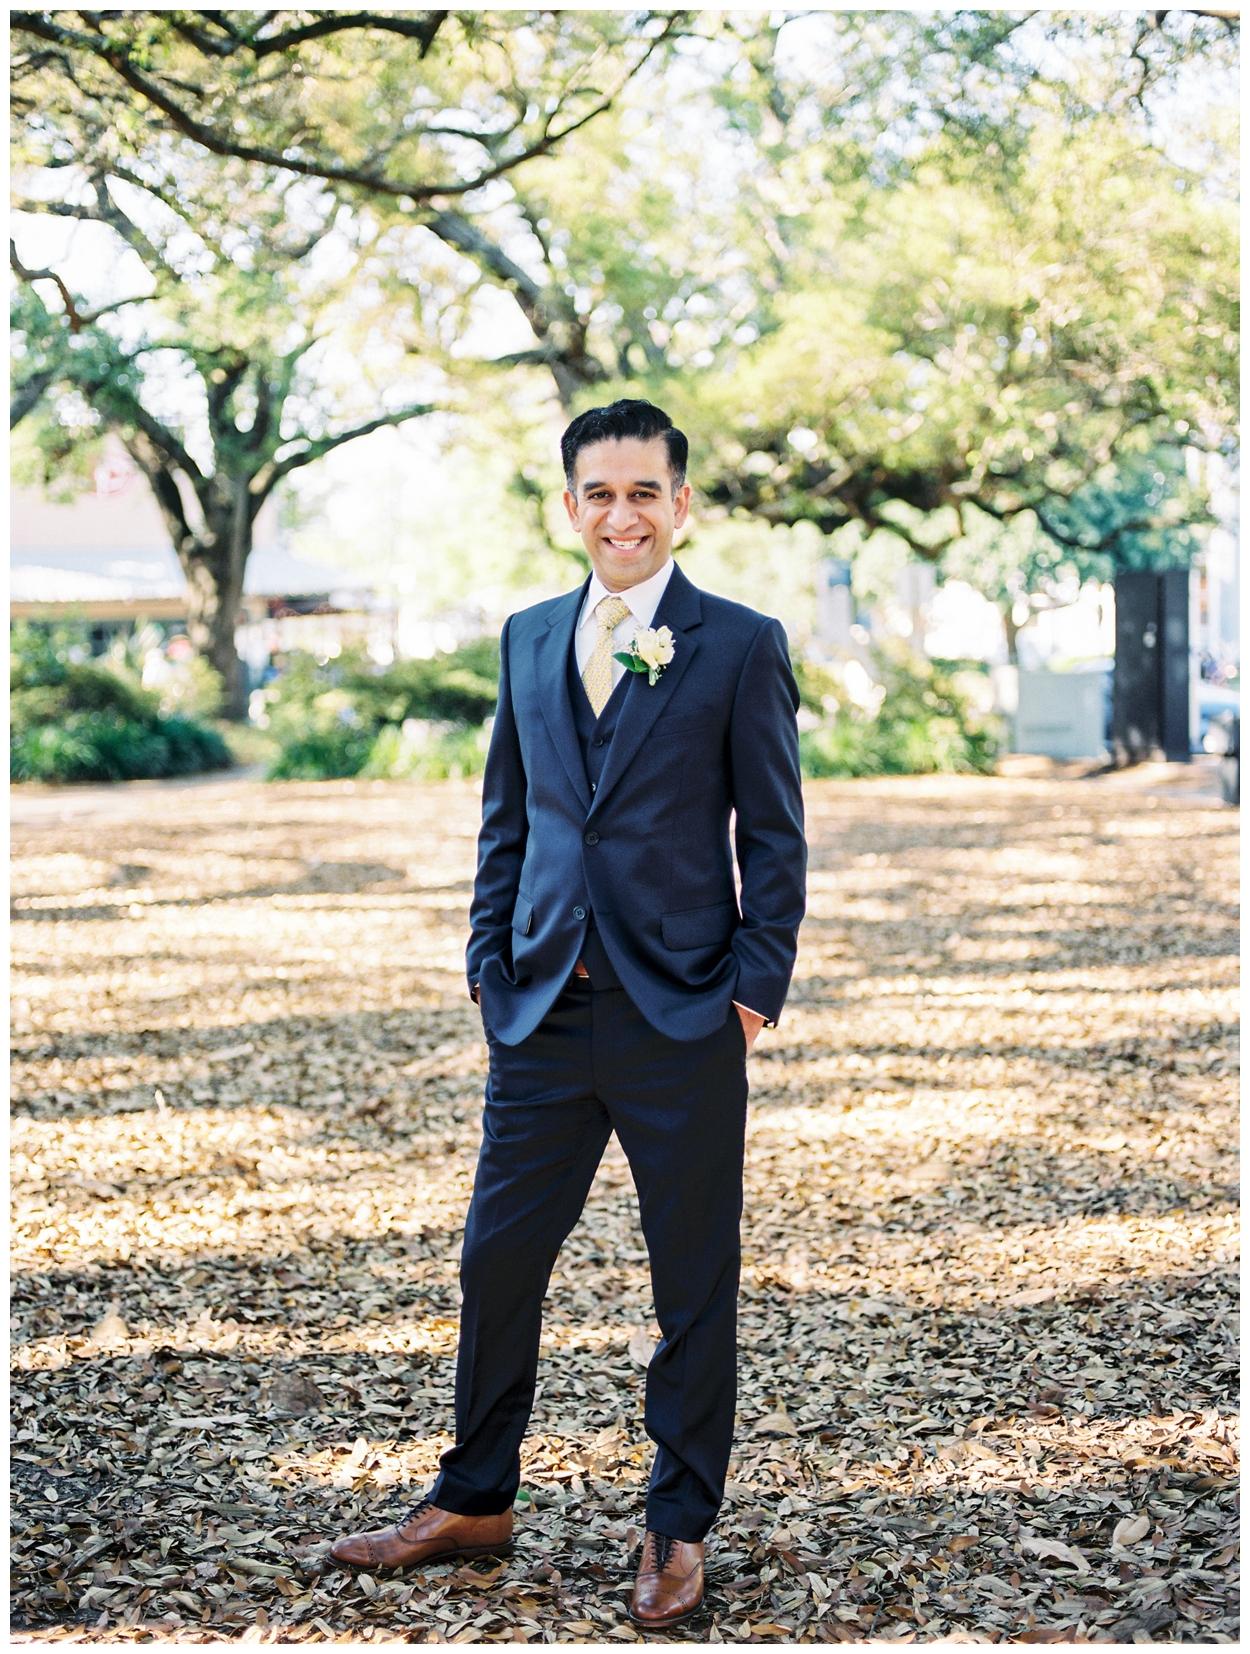 spring pensacola florida wedding at 5eleven Palafox by fine art washington dc and destination wedding photographer Lissa Ryan Photography